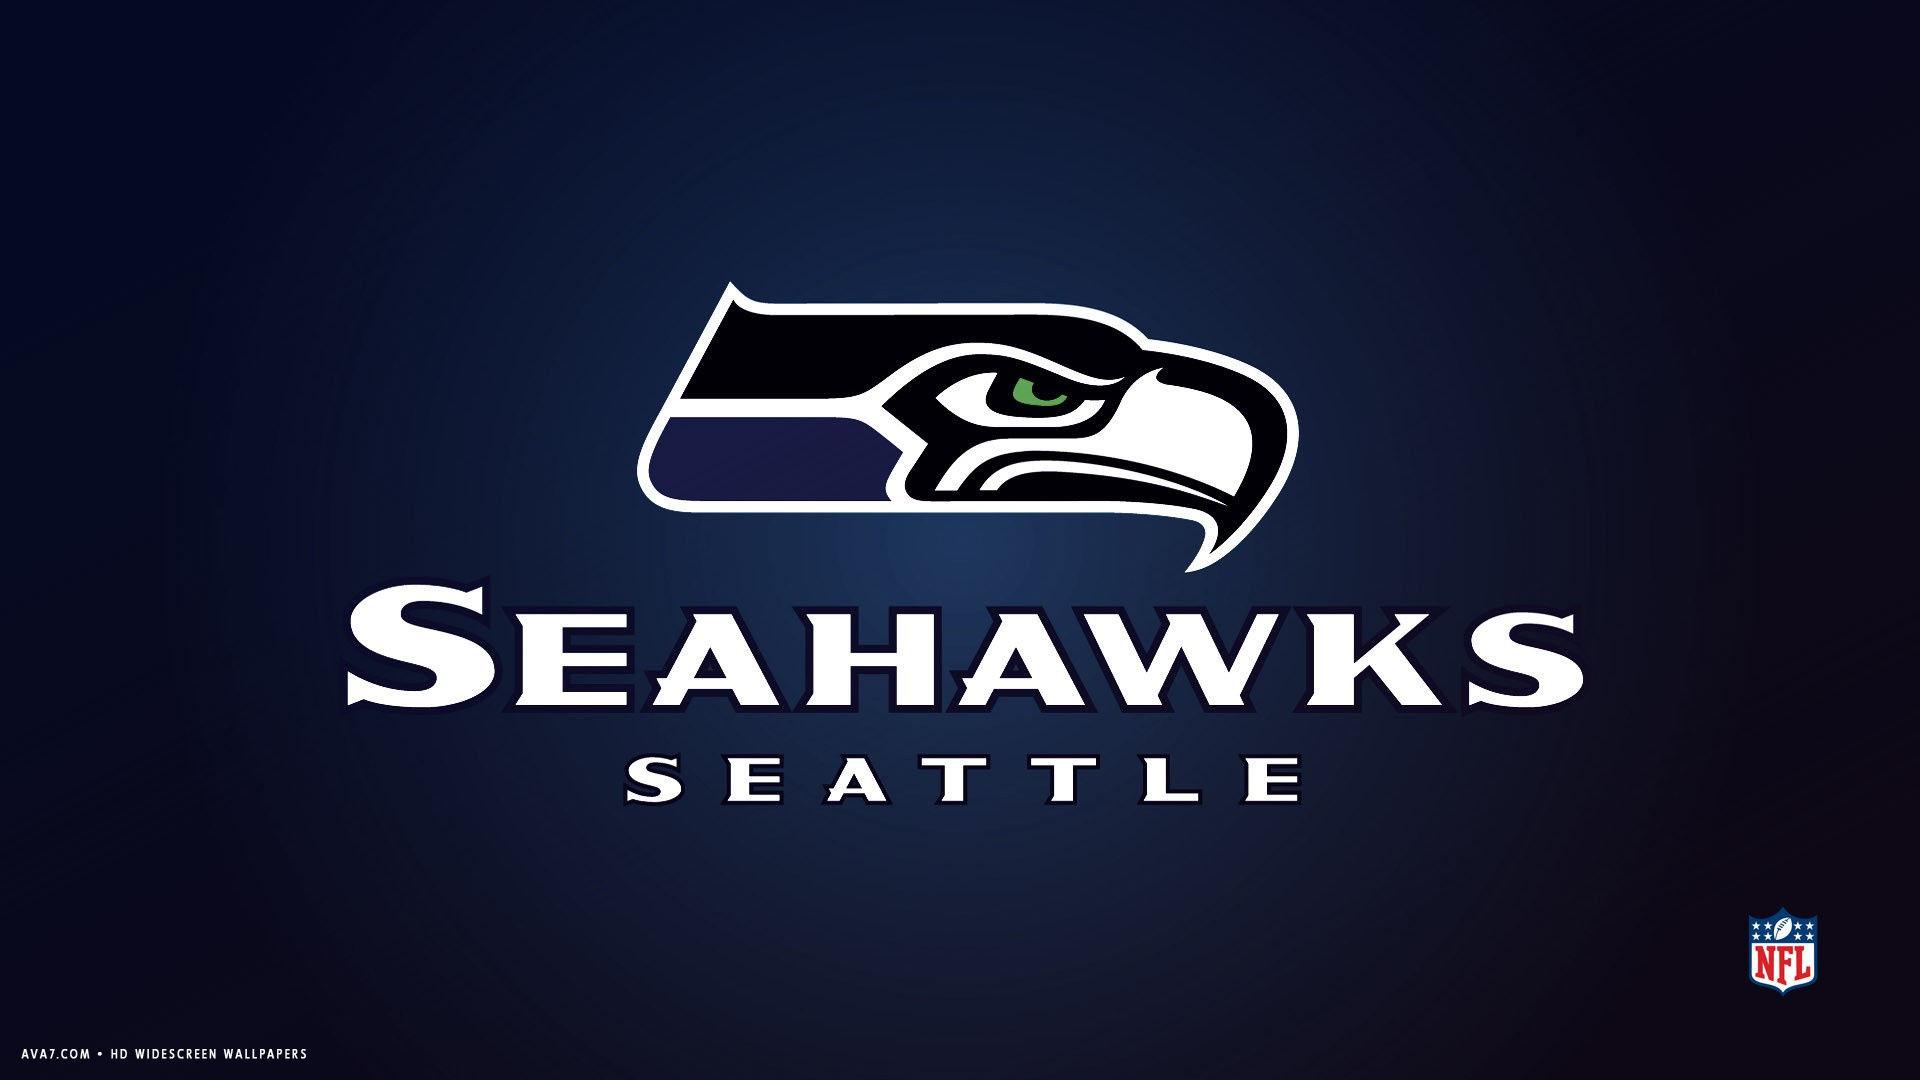 seattle seahawks nfl football team hd widescreen wallpaper